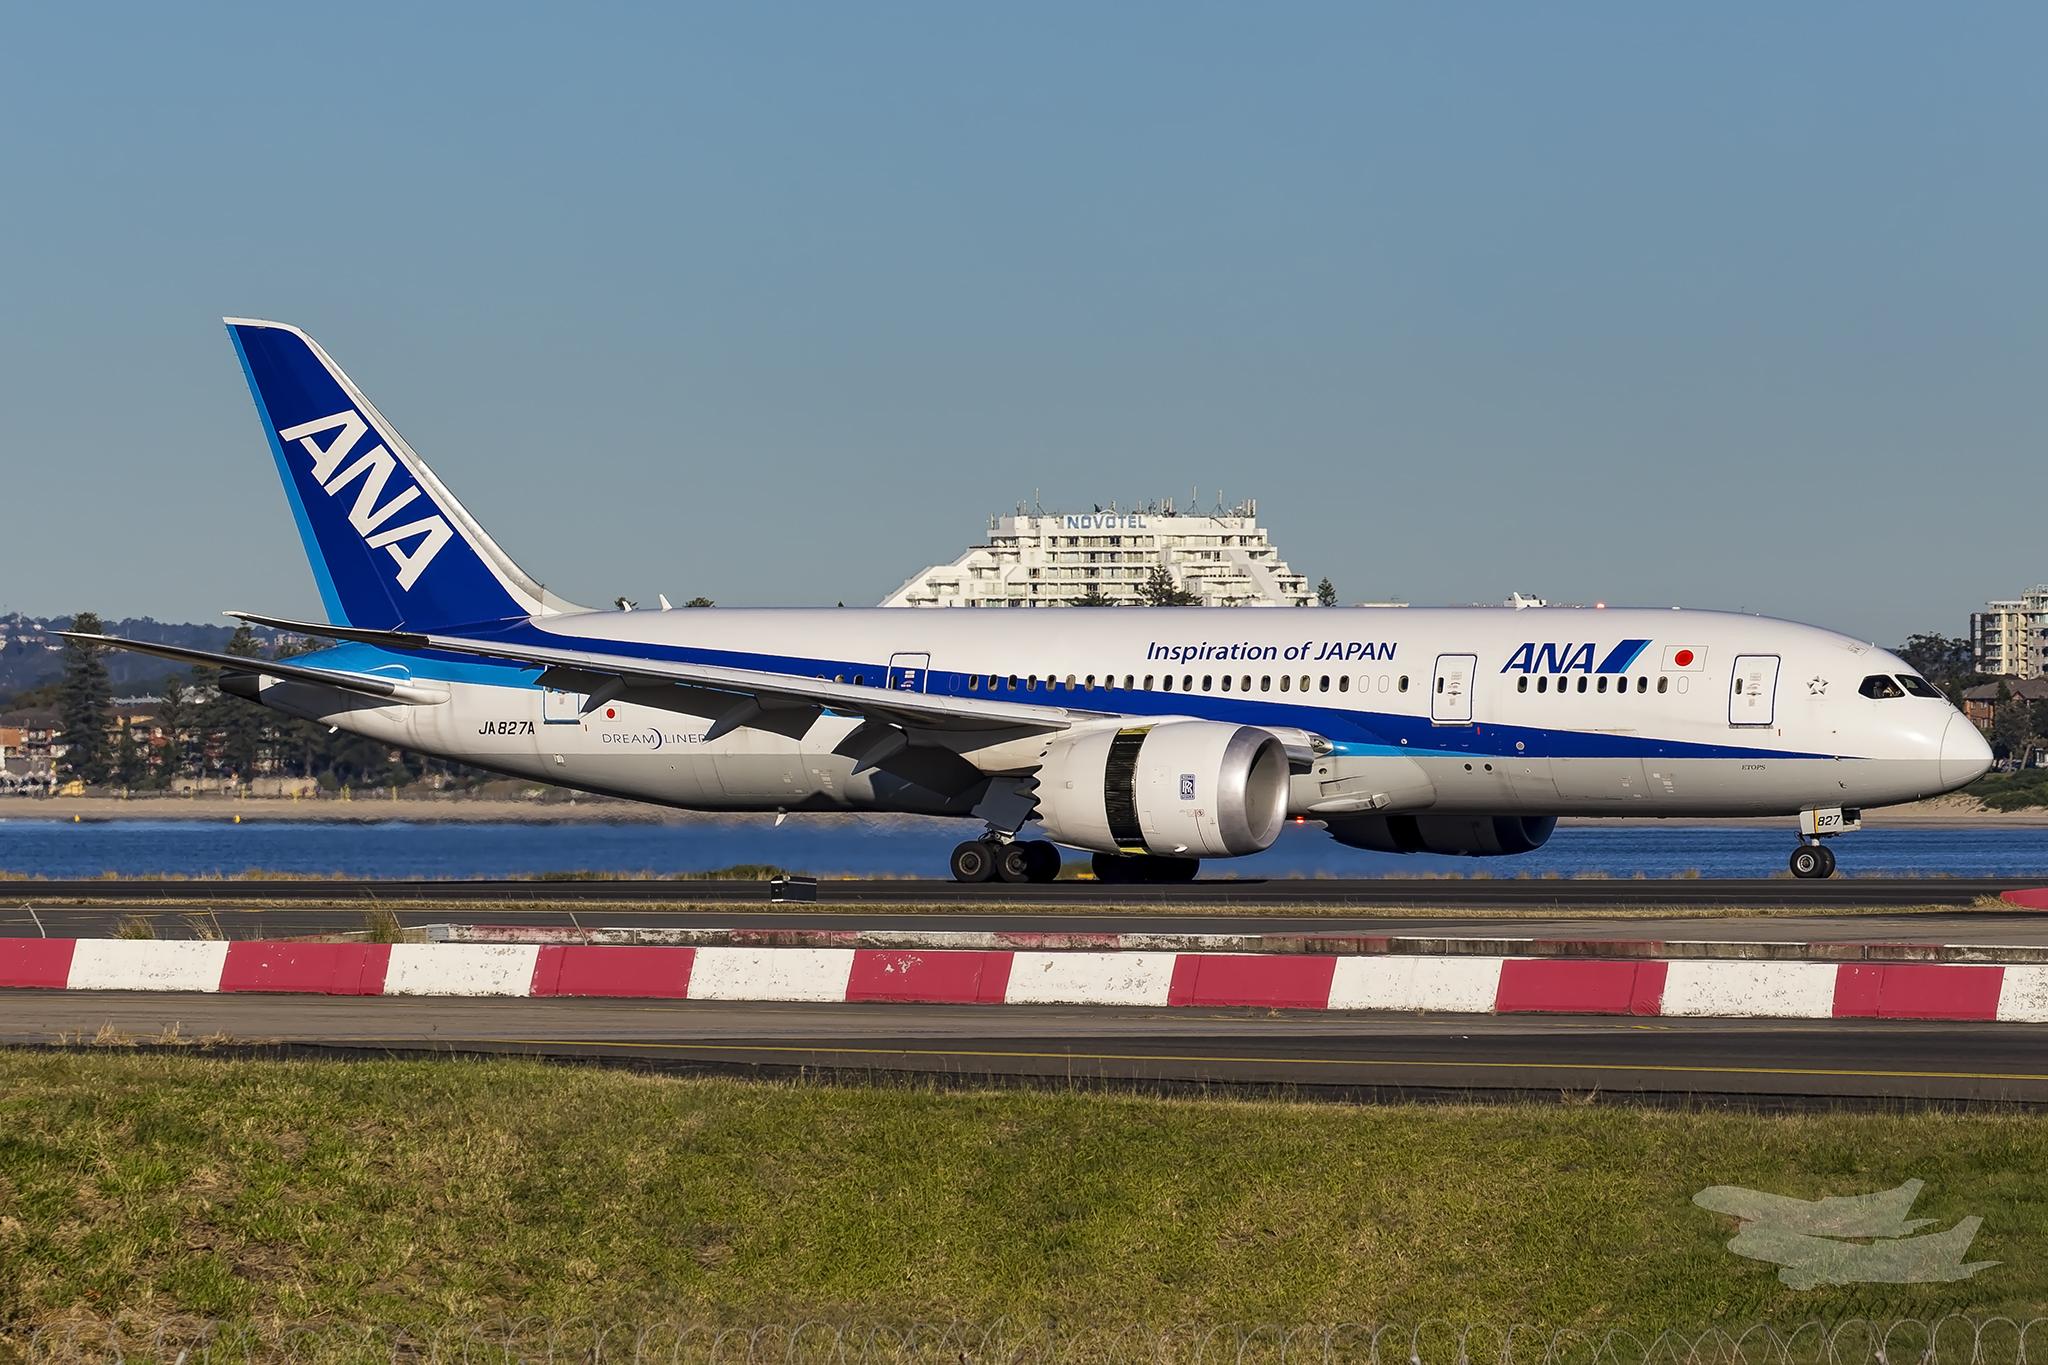 ANA 787-9 (Image: Bernard Proctor)